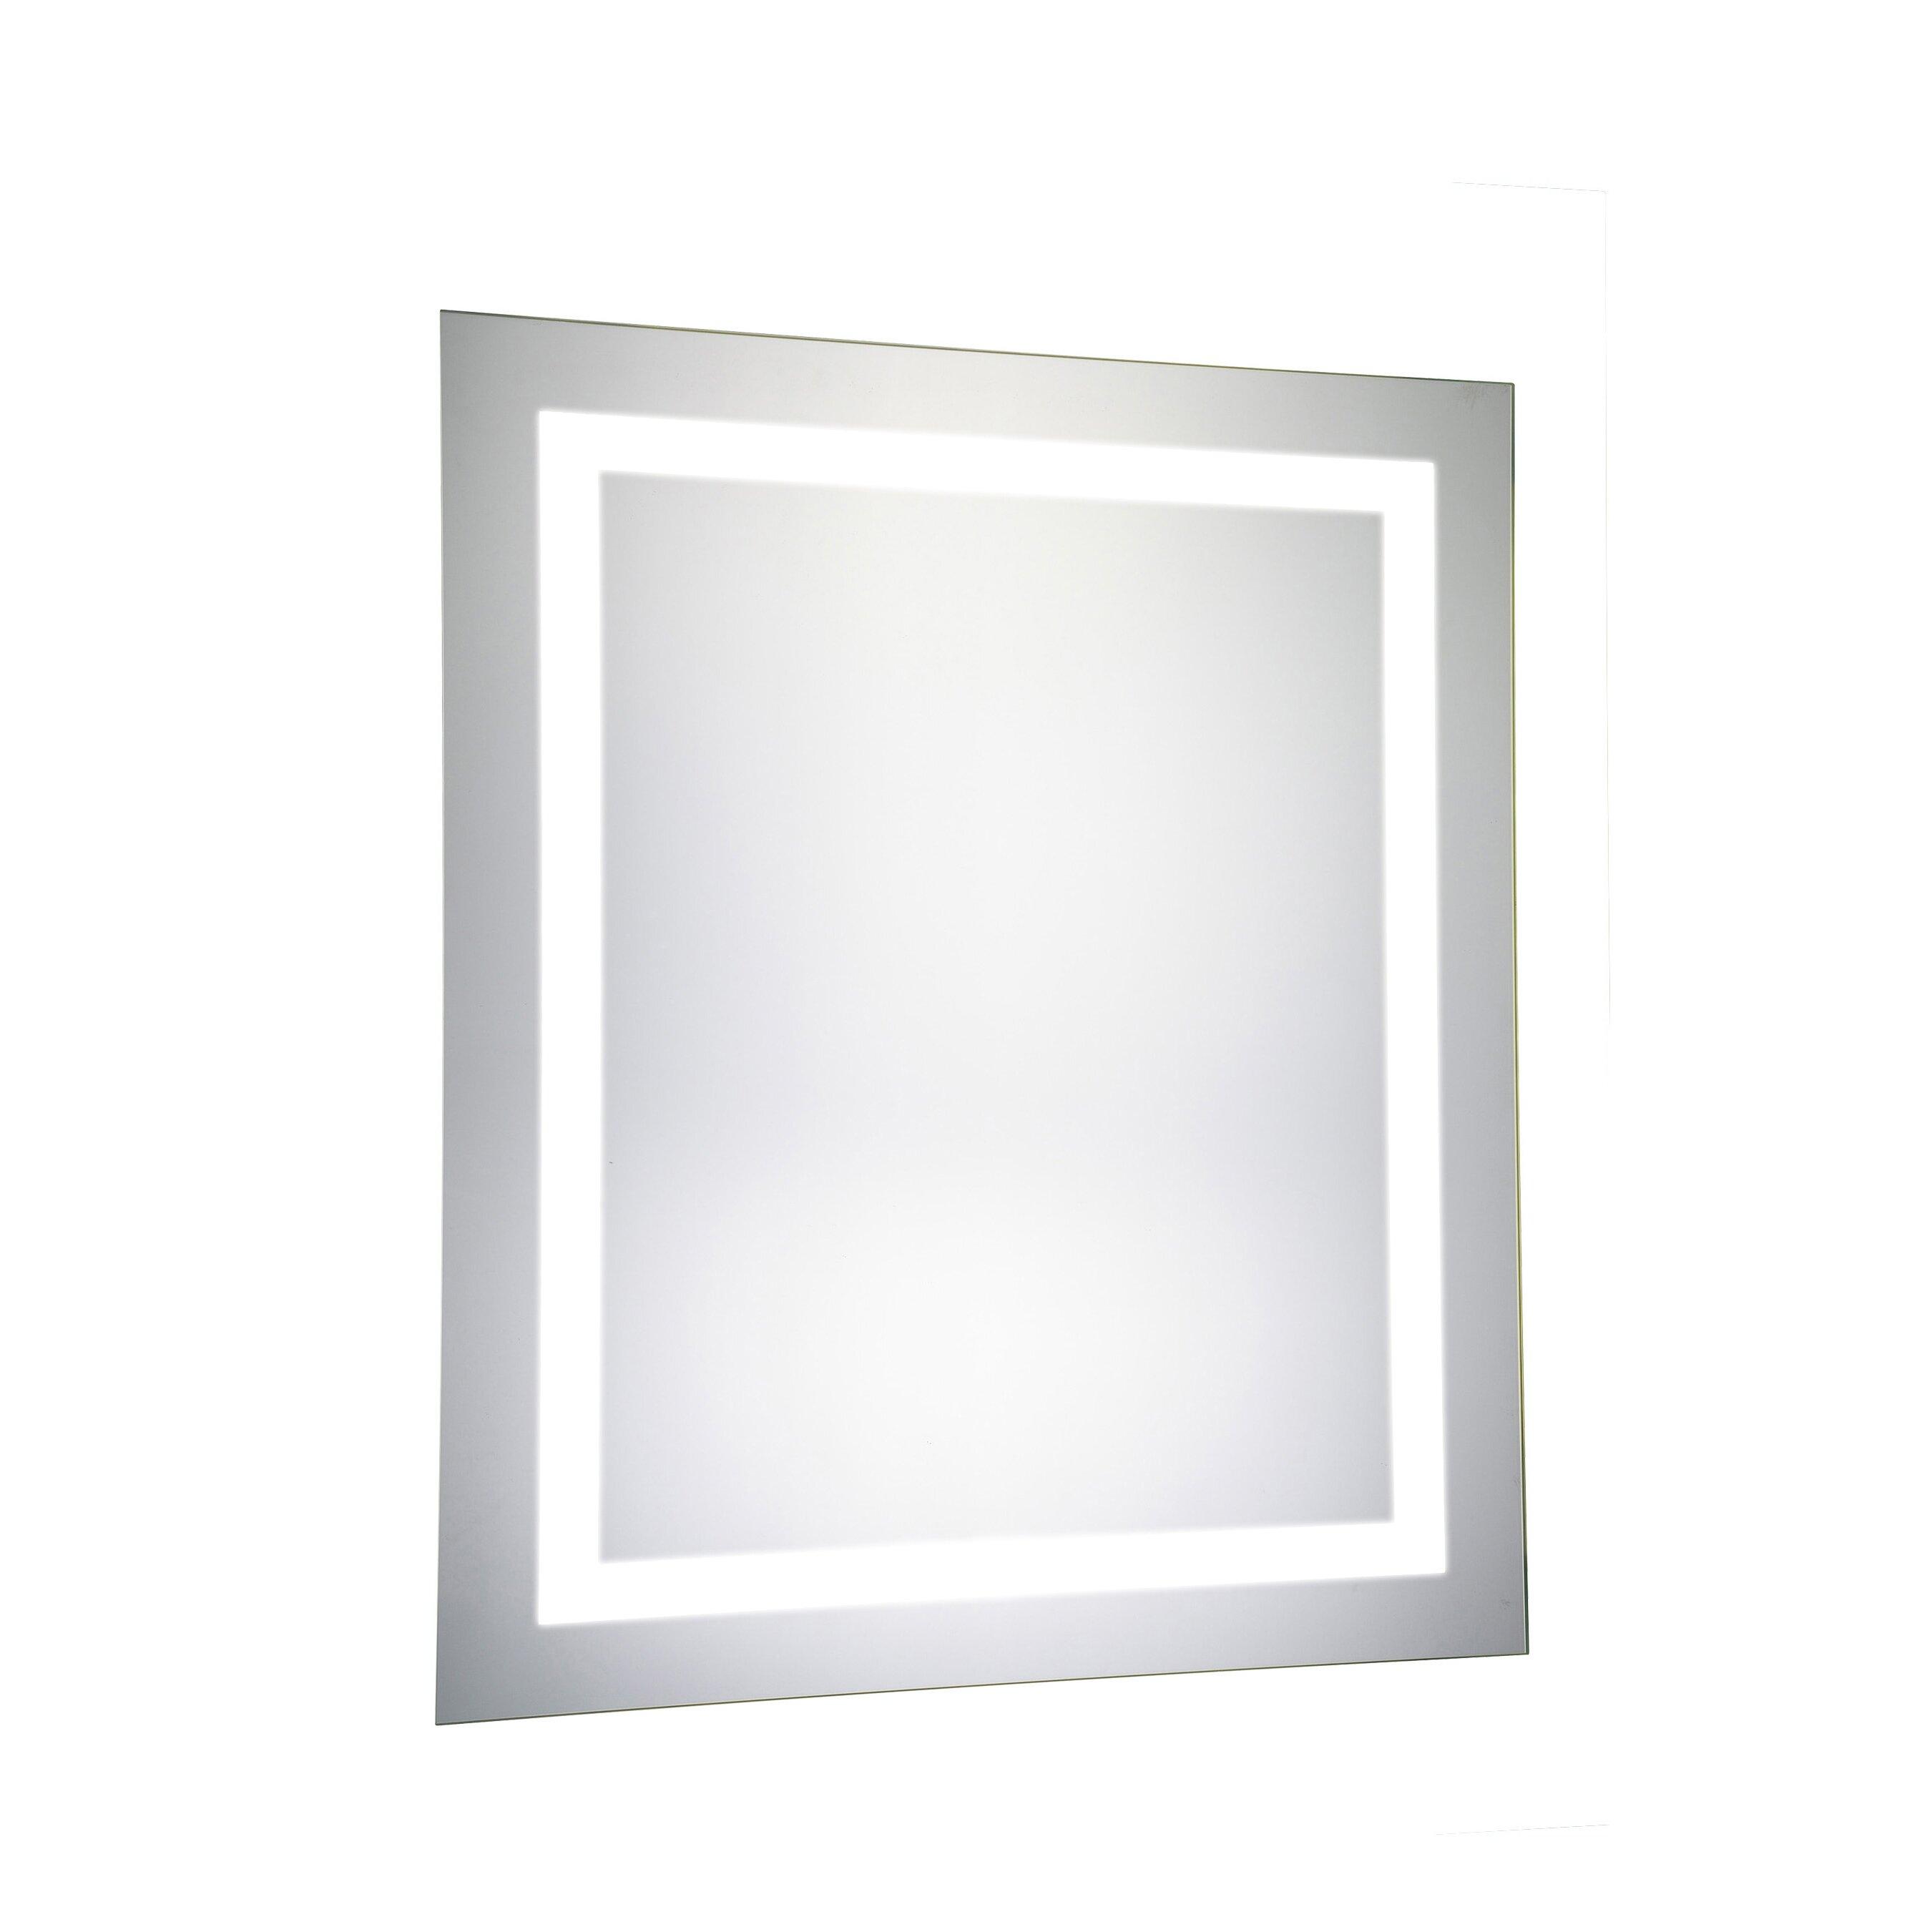 Elegant lighting nova led electric rectangle mirror for Elegant mirrors